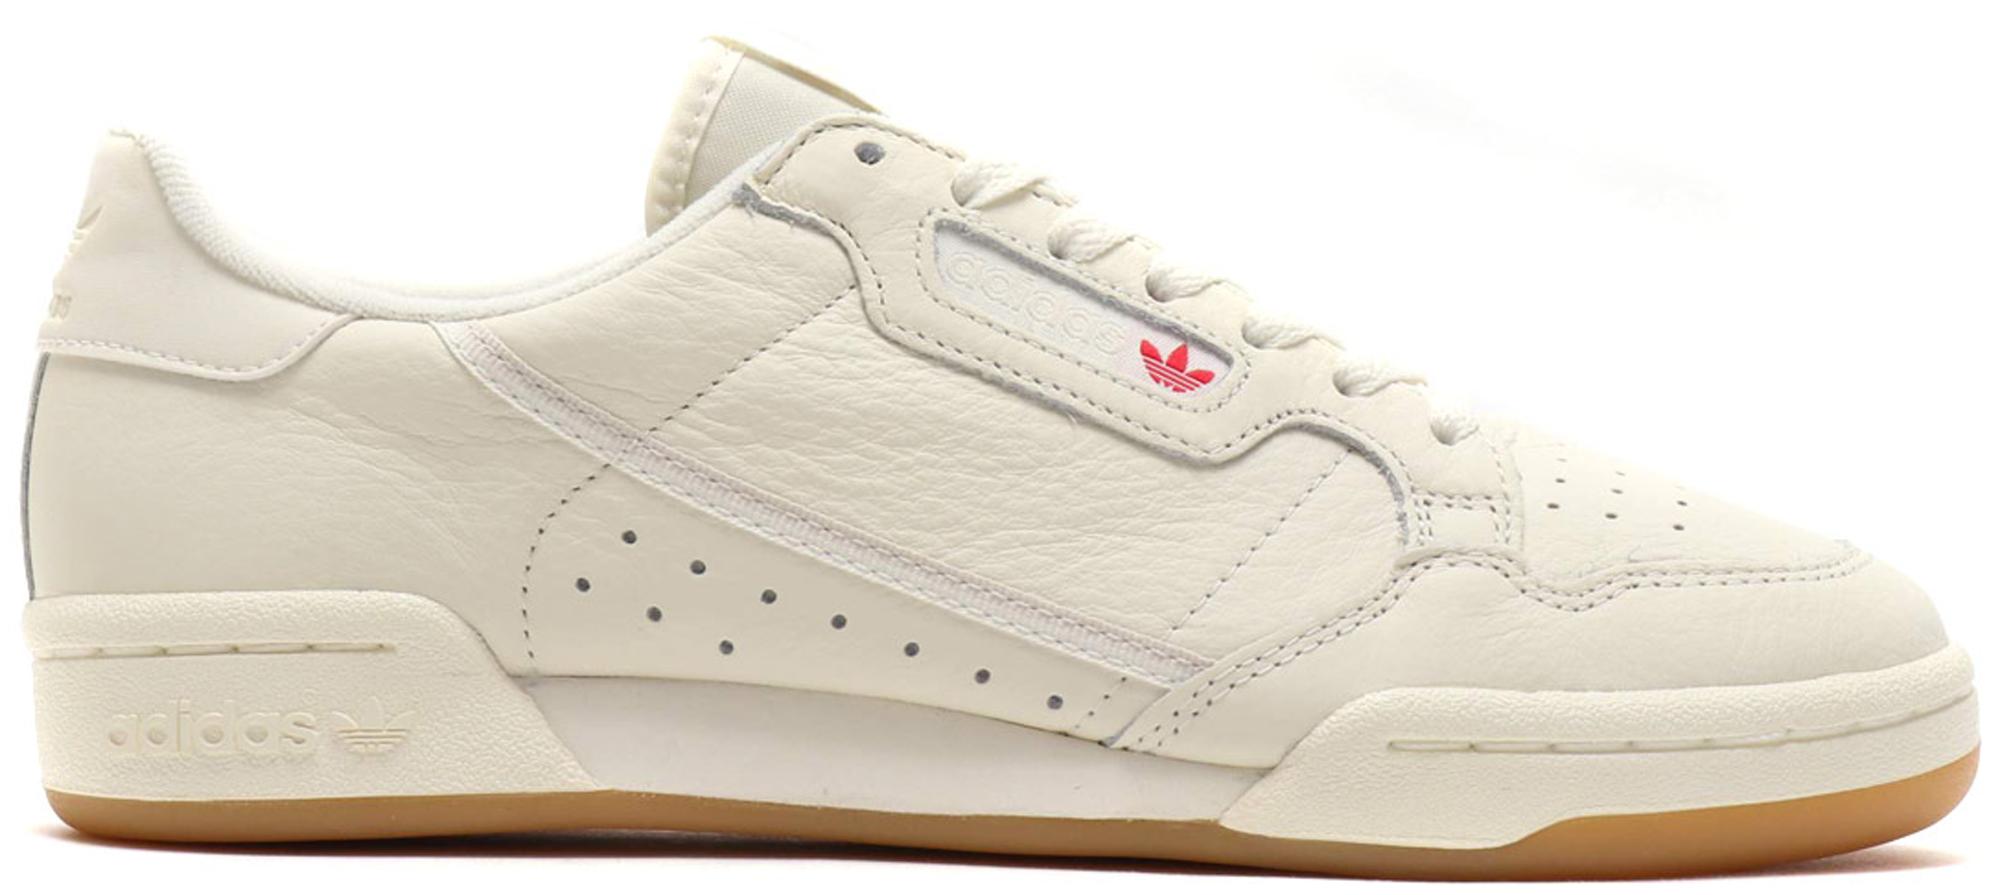 adidas Continental 80 Off White Gum